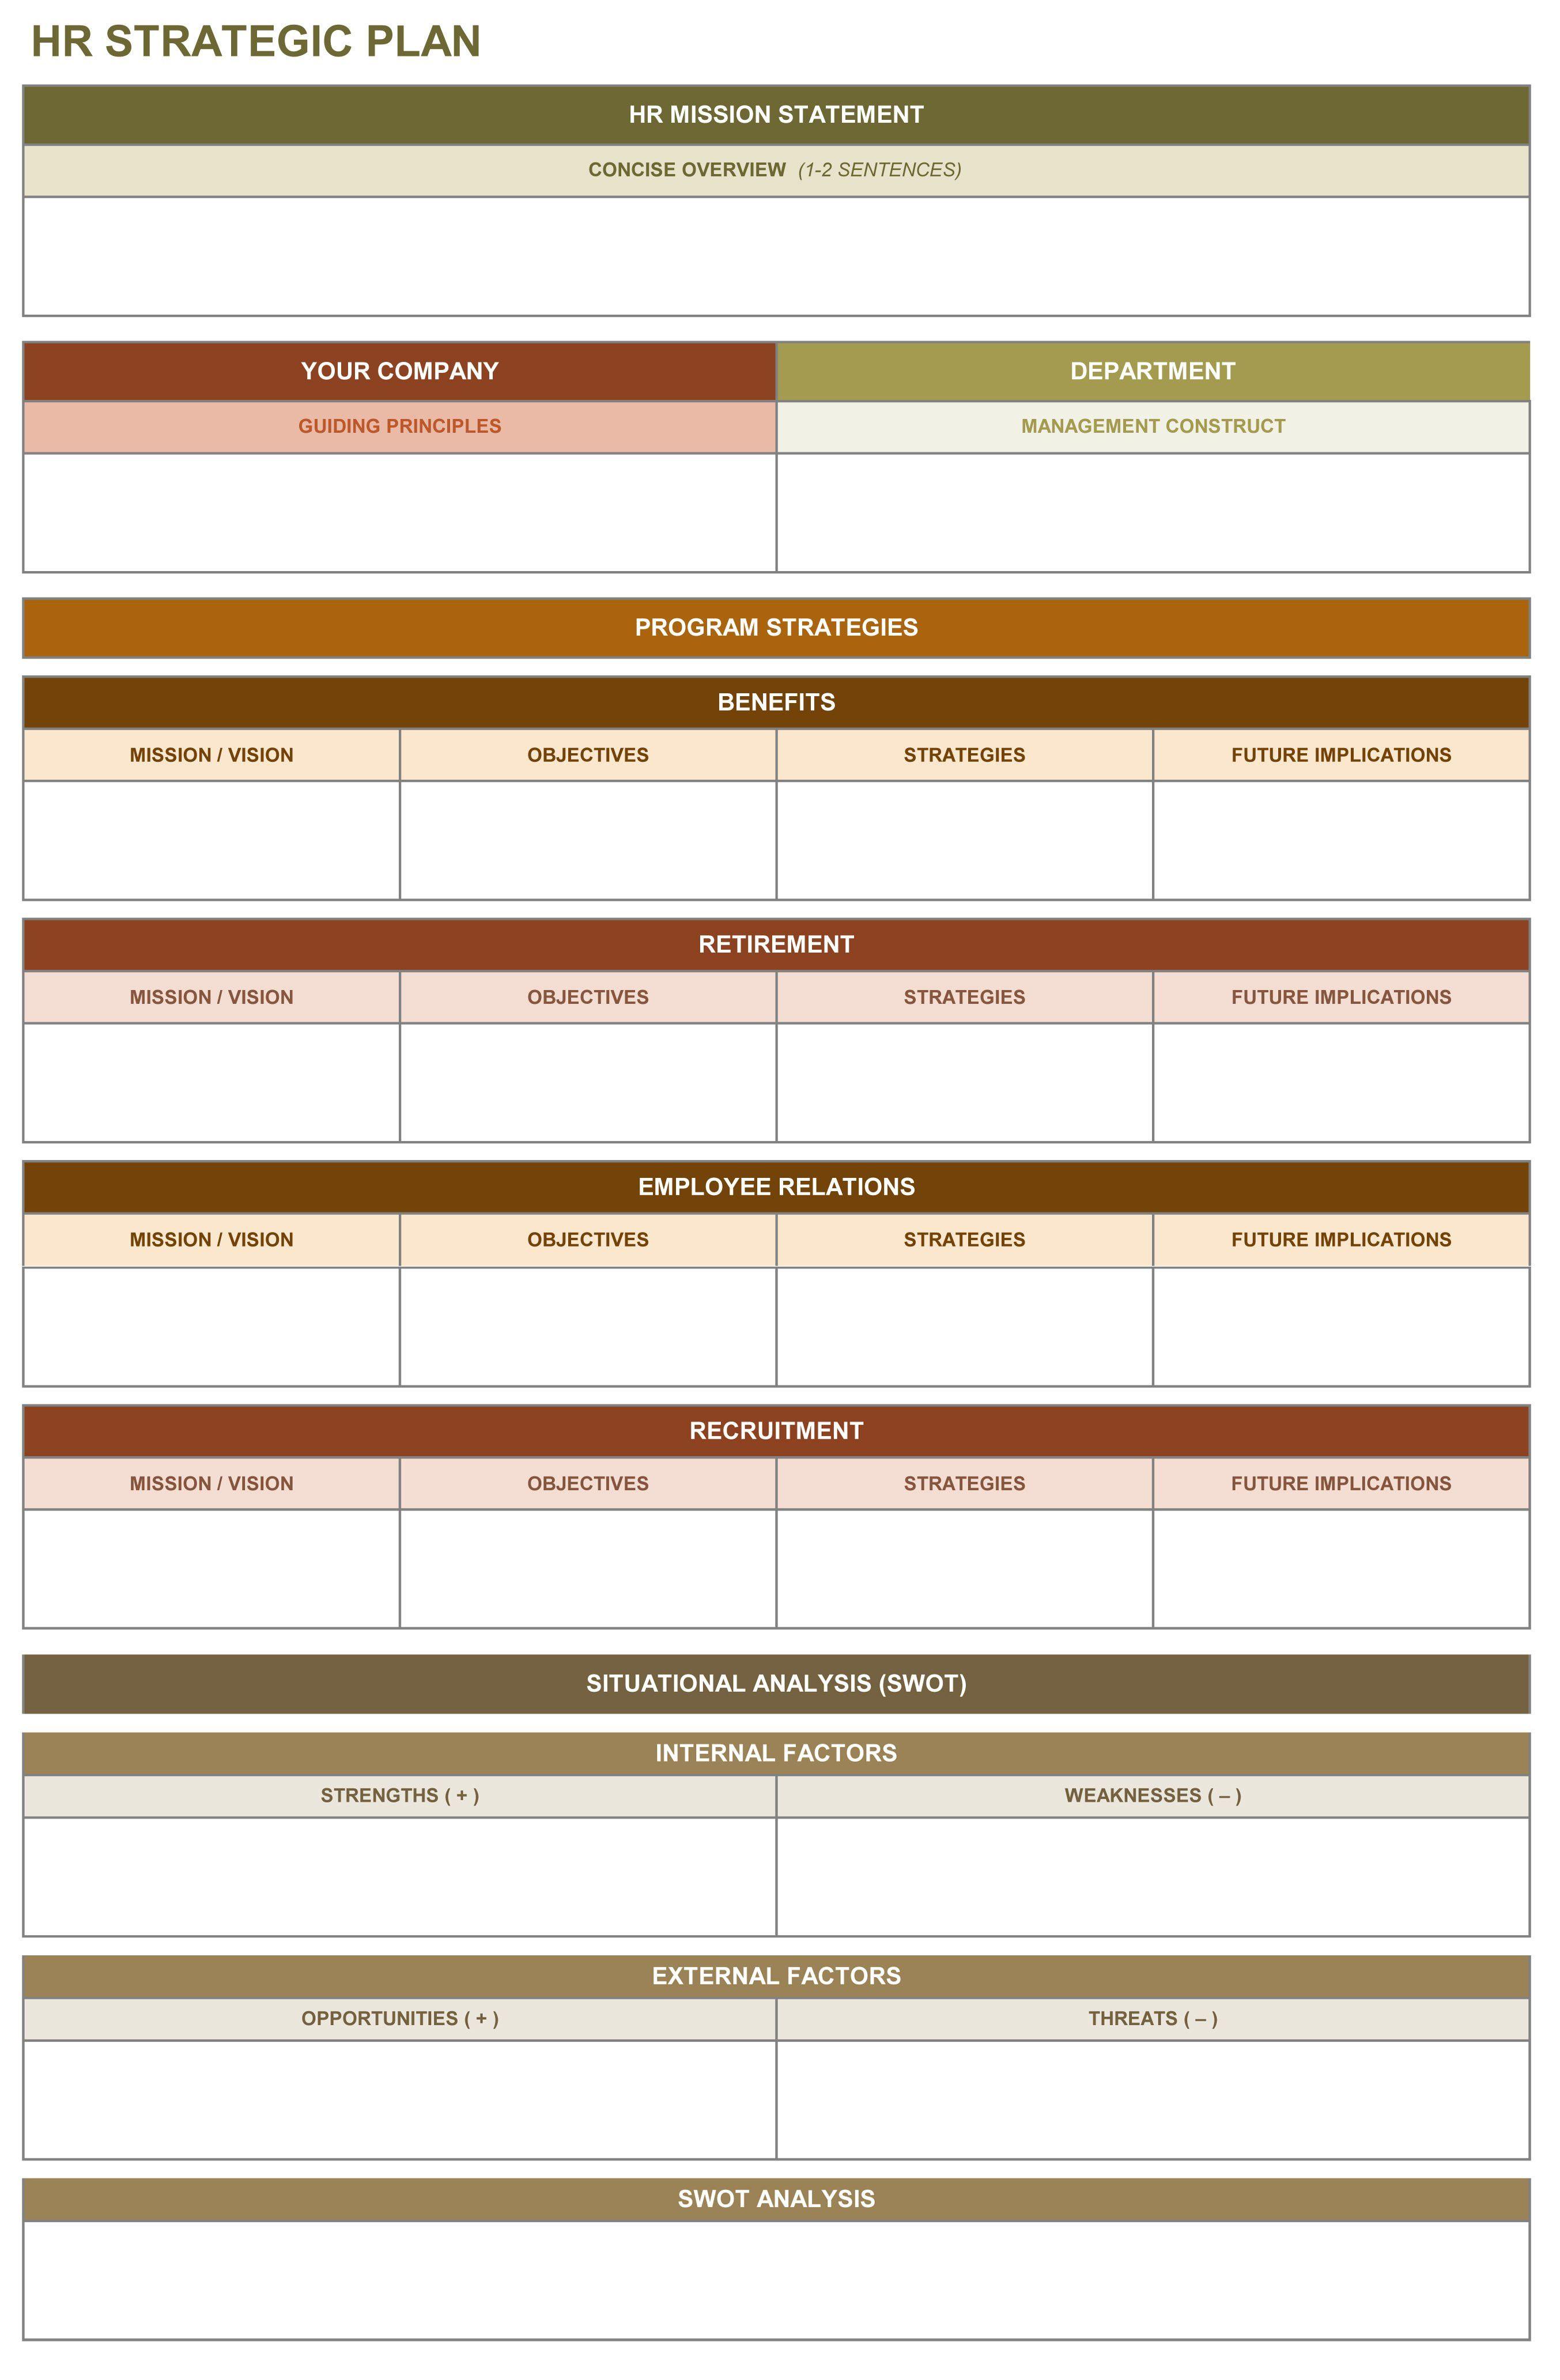 Hr Strategic Plan Excel Template